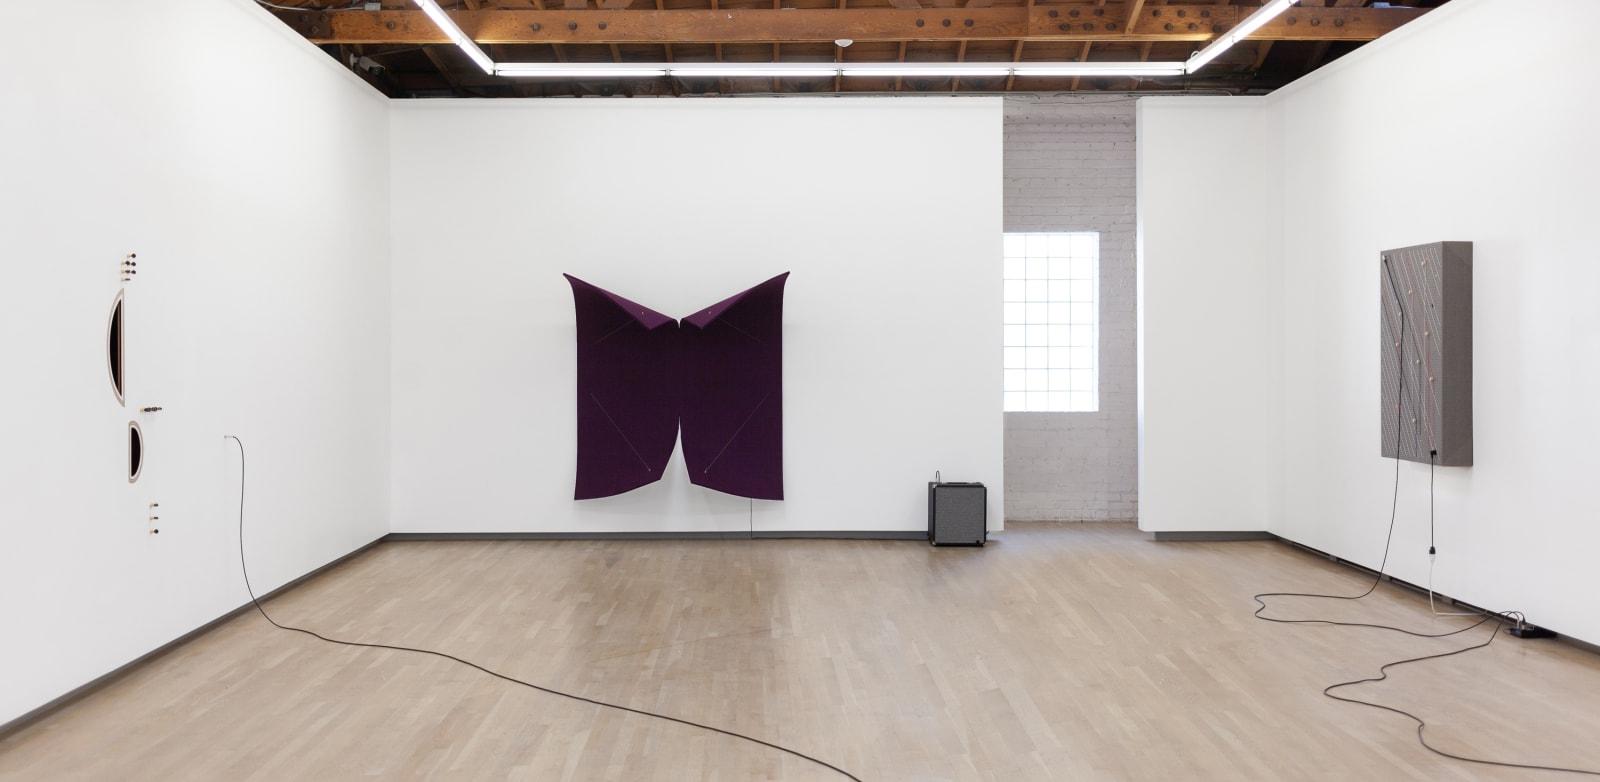 Naama Tsabar, Inversions, installation view